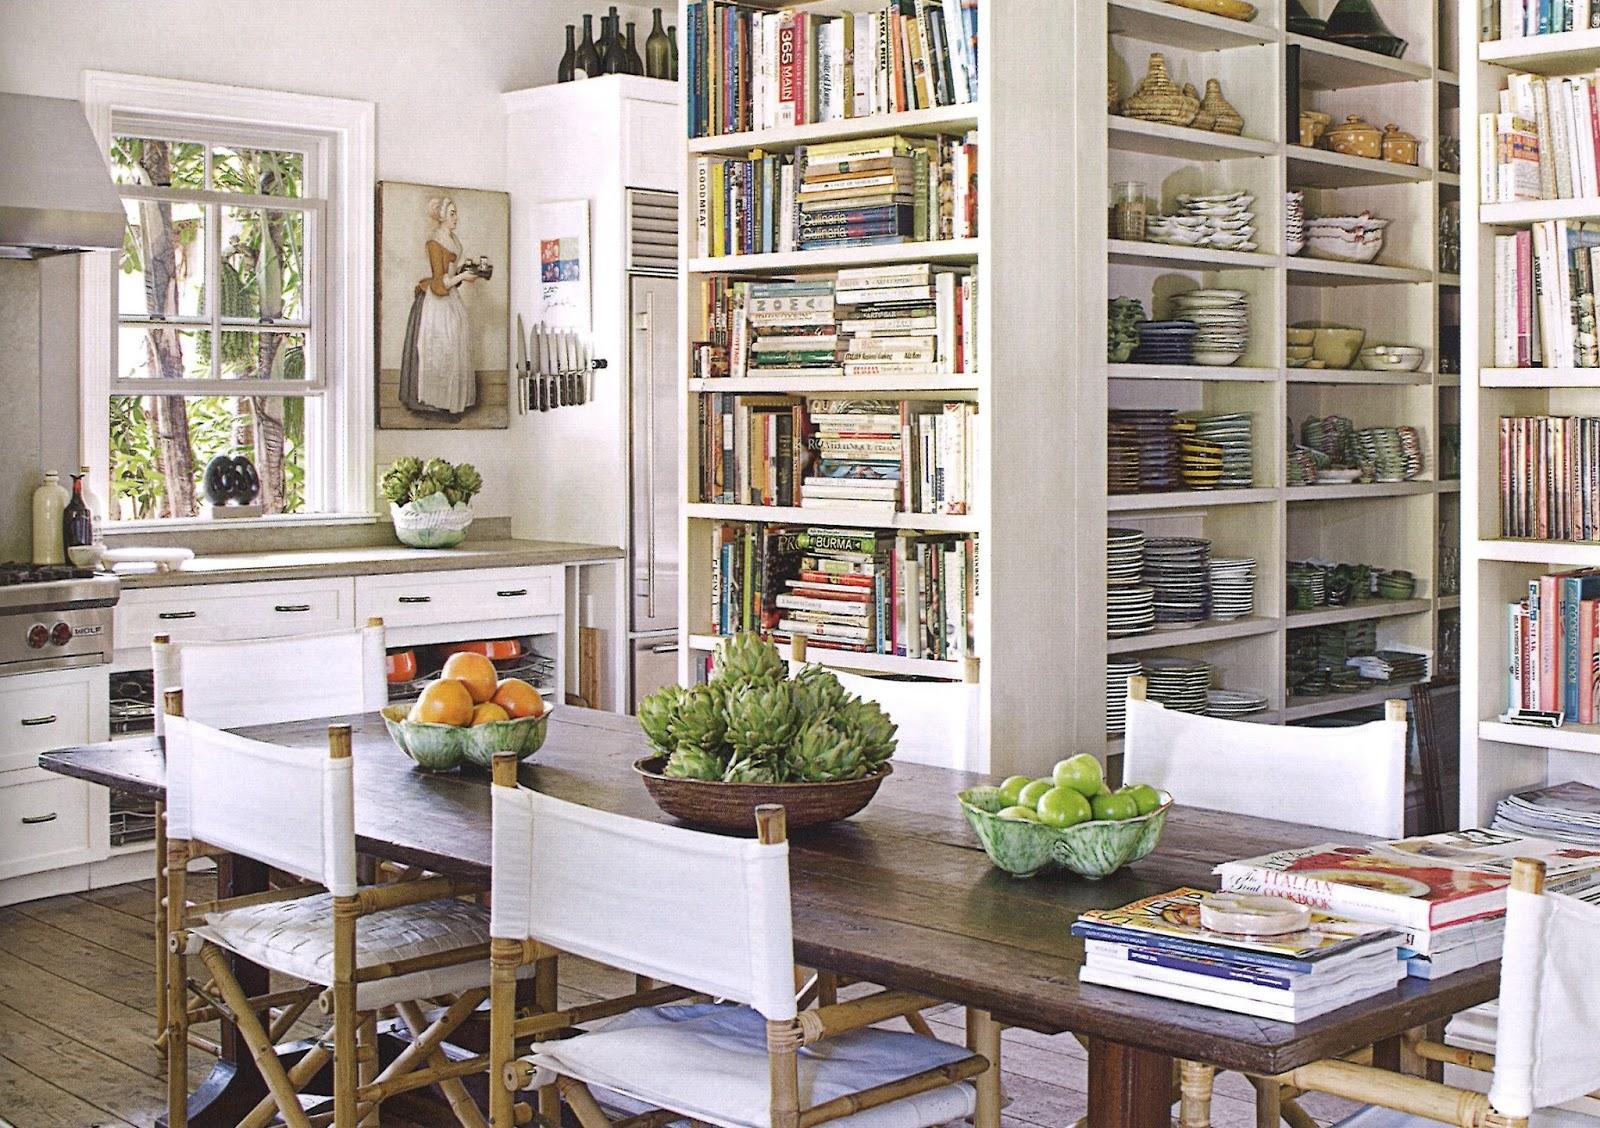 Architect design palm beach chic the villa artemis for Artemis kitchen designs